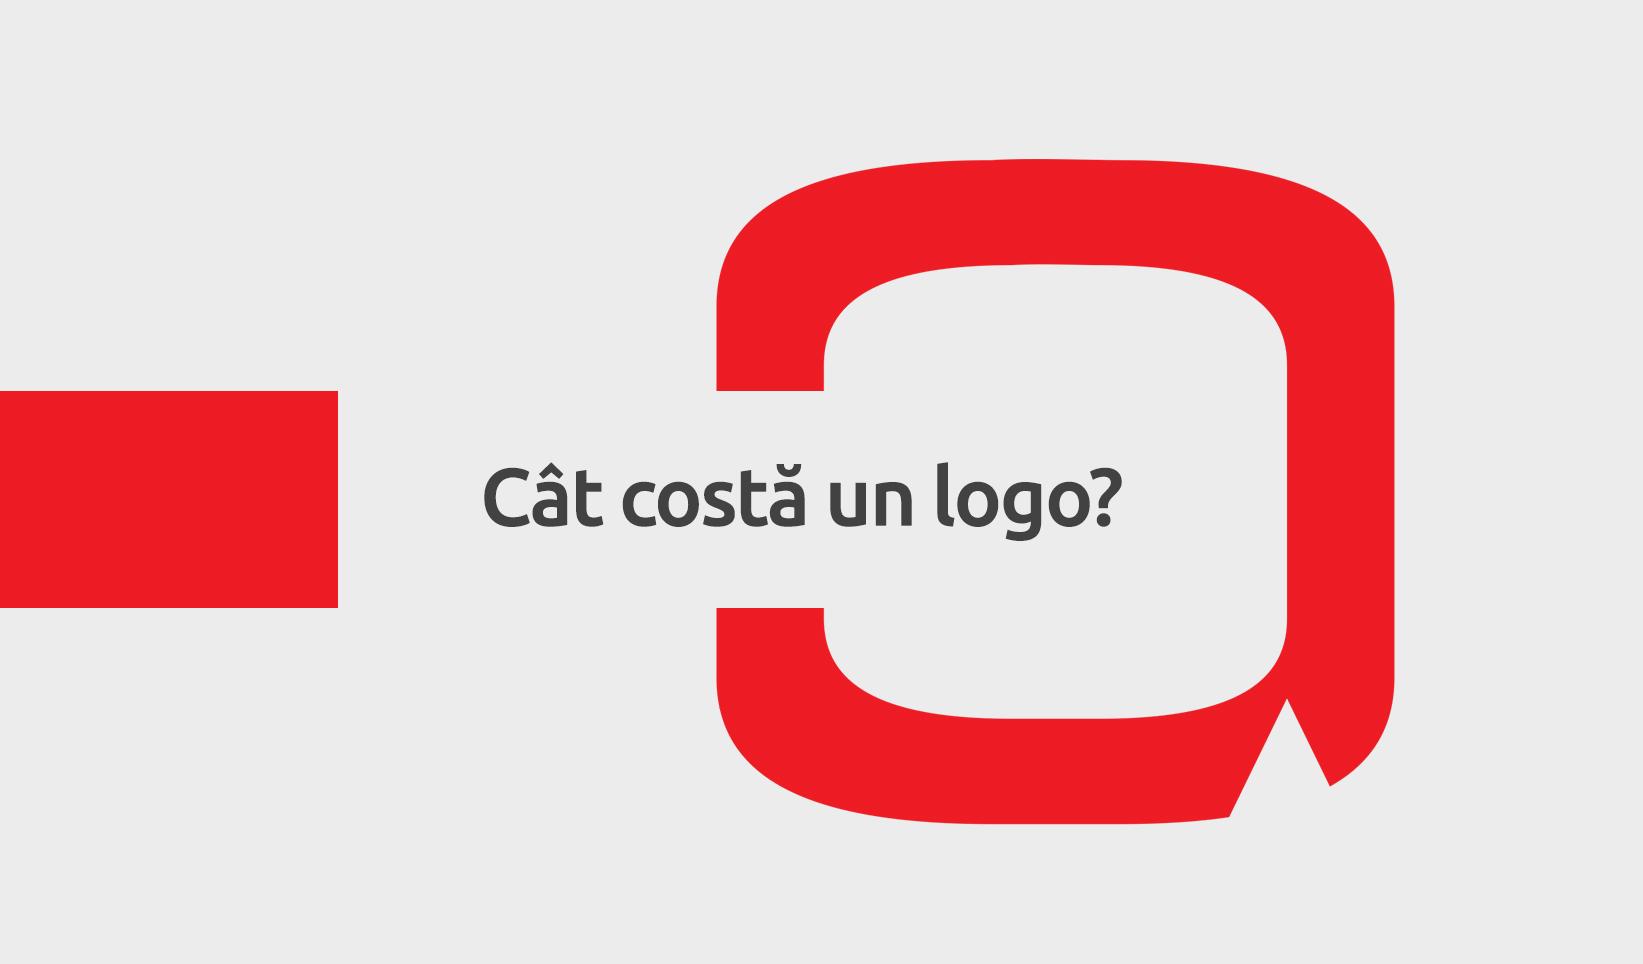 Cat-costa-un-logo